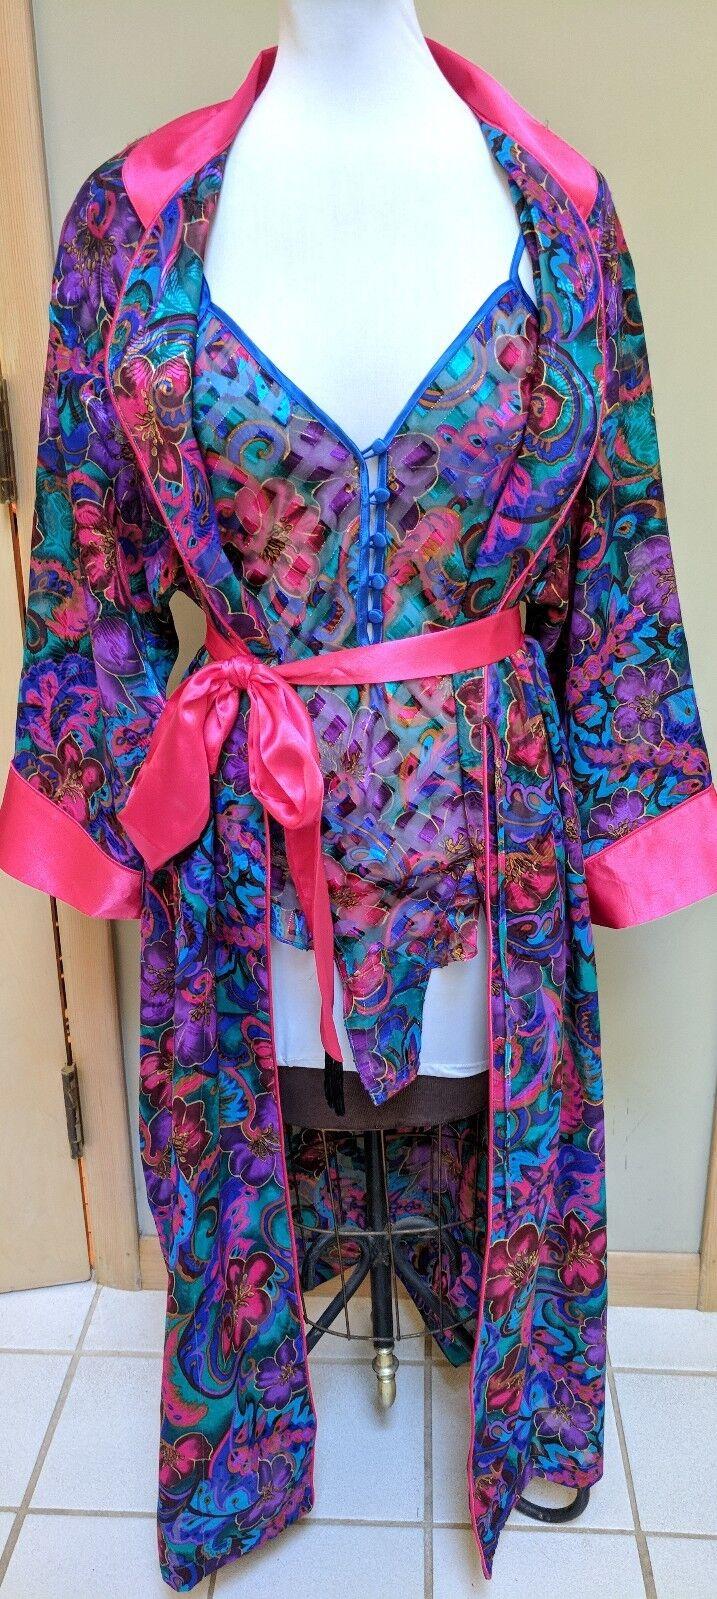 New Vintage Victoria's Secret Teddy & Robe Textured Satin Lingerie Set Small S P